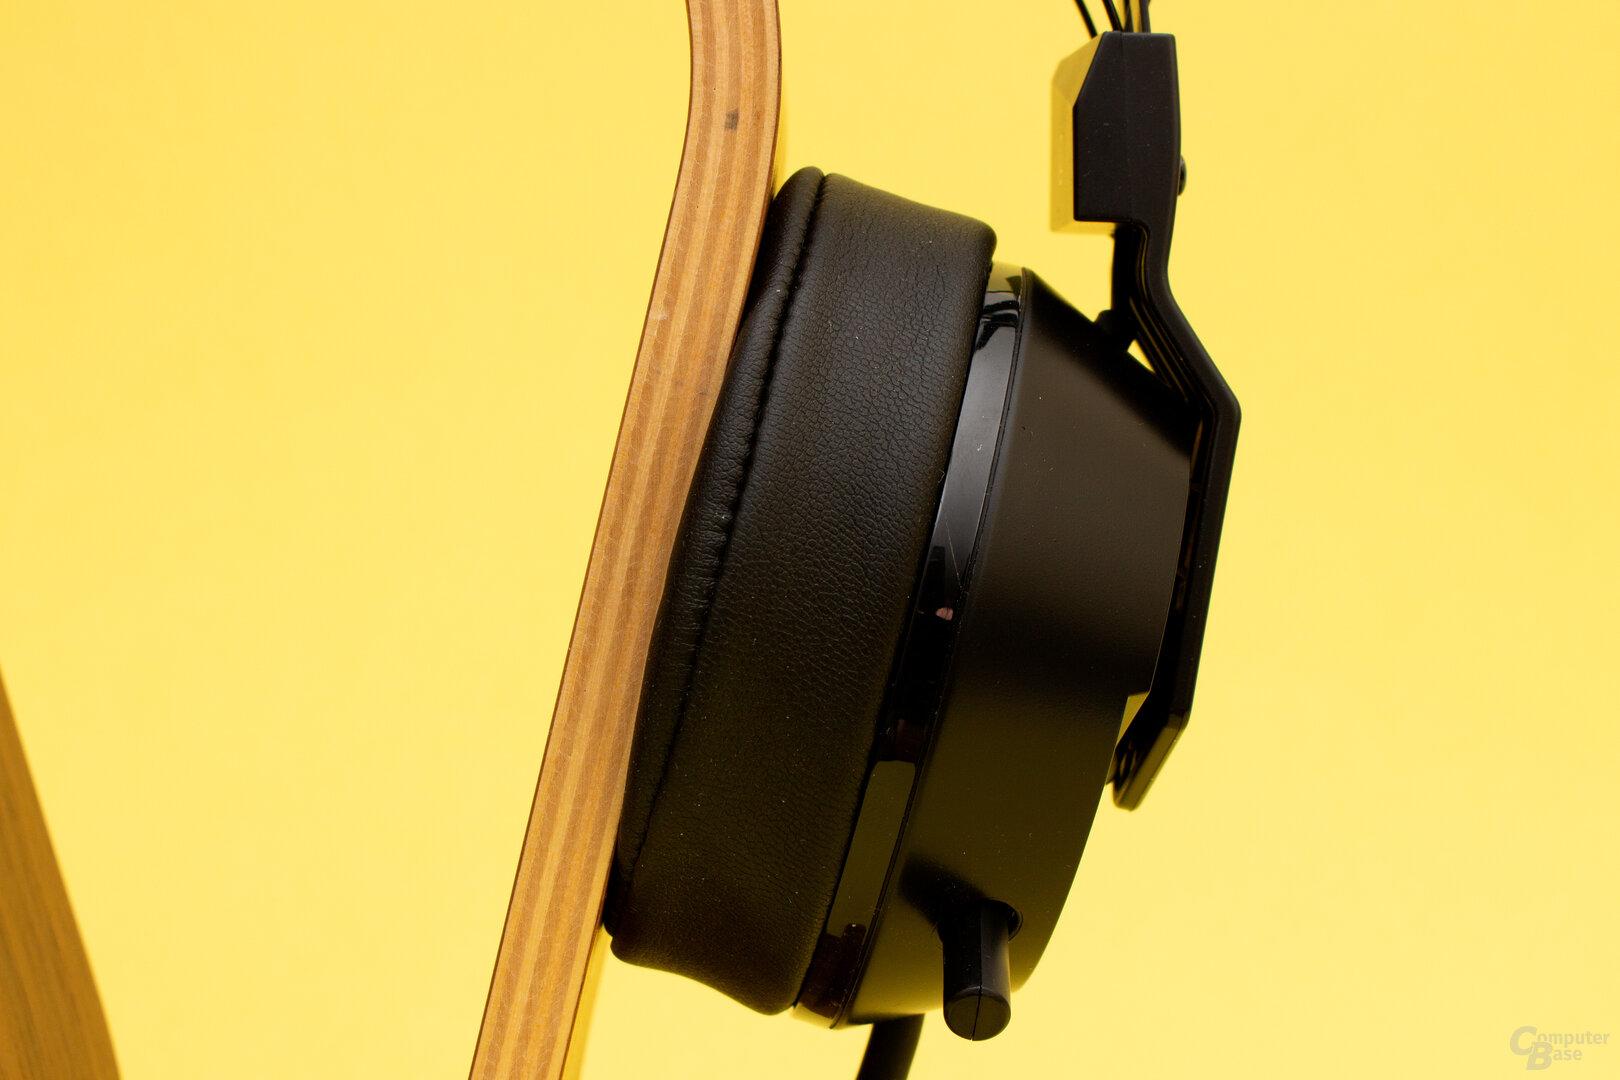 Das Mikrofon lässt sich beim F.R.E.Q.4 in der Ohrmuscheln verstauen